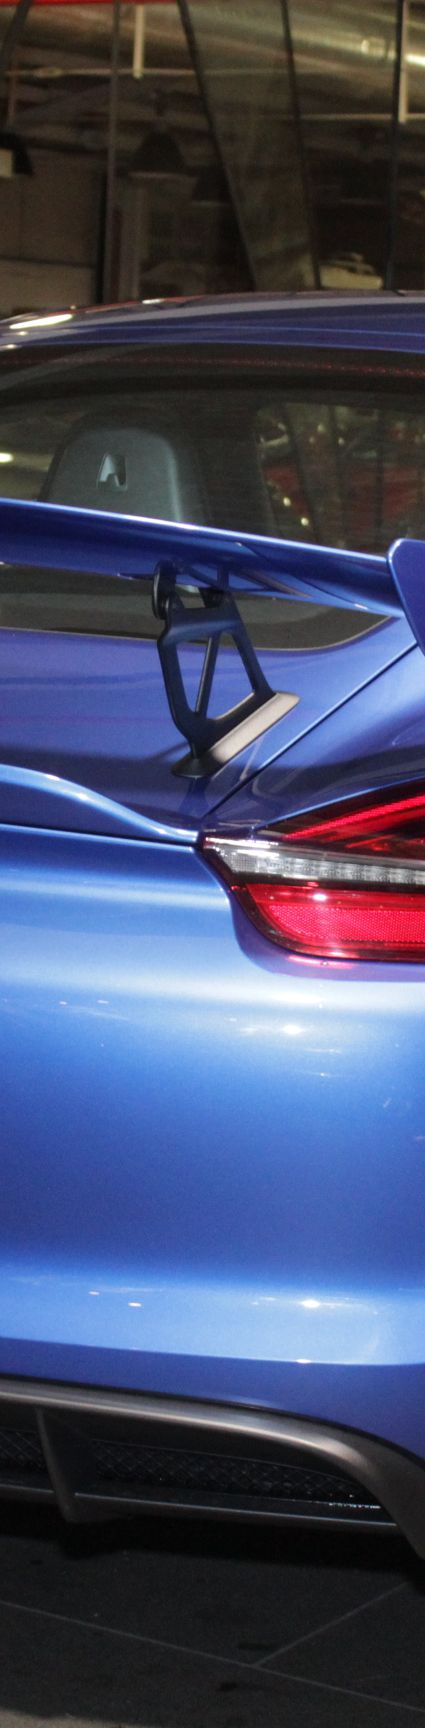 2015 Porsche Cayman 981 GT4 Coupe 2 door manual blue at Dutton Garage 41 Madden Grove Richmond 3121 Melbourne Victoria Australia Make Mine Rare Dutton Group